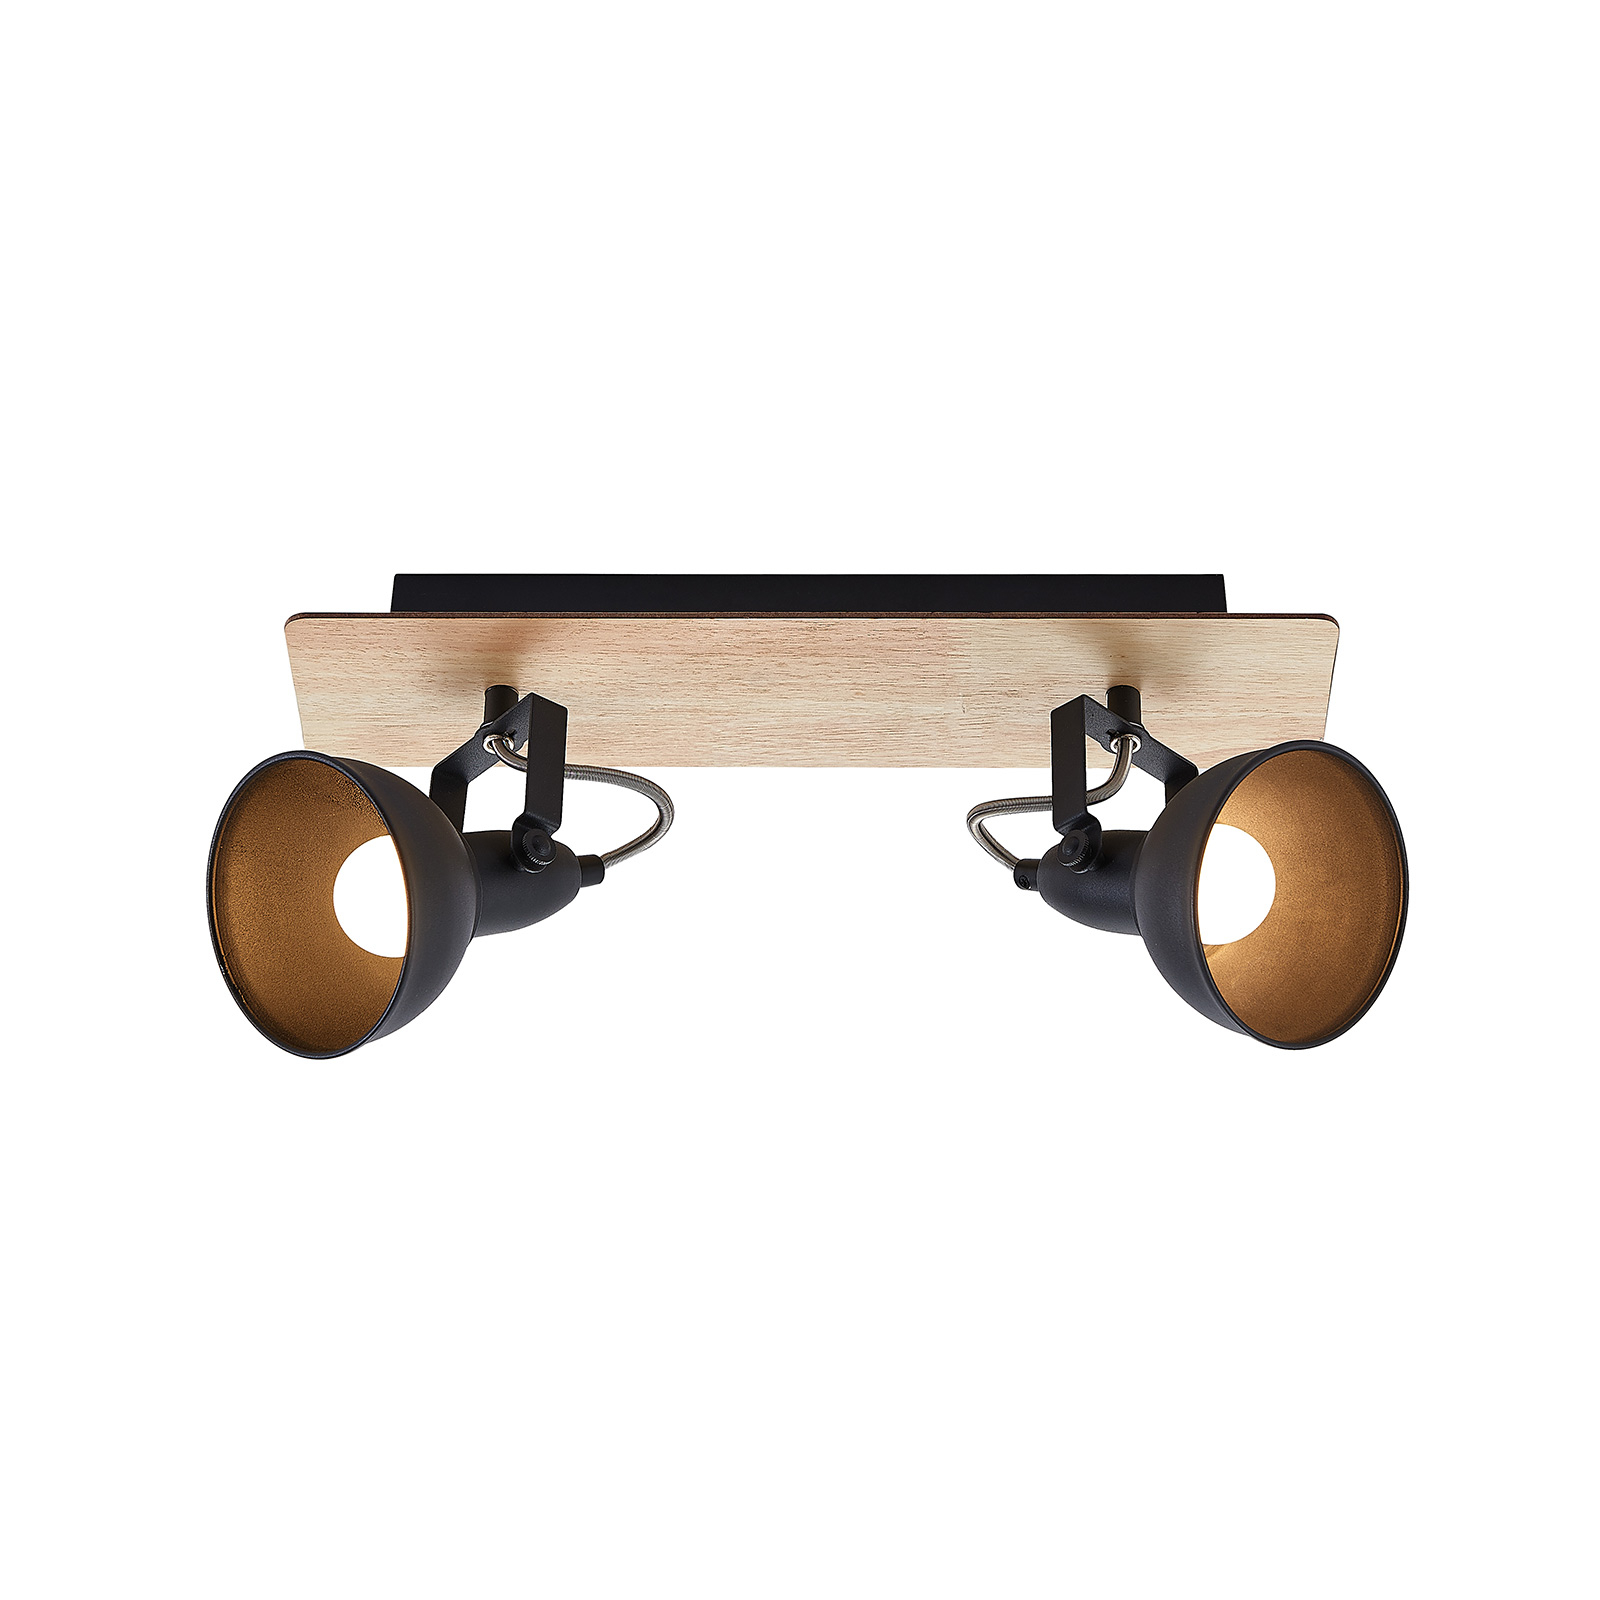 Lindby Aylis Deckenlampe, schwarz, Holz, 2-fl.